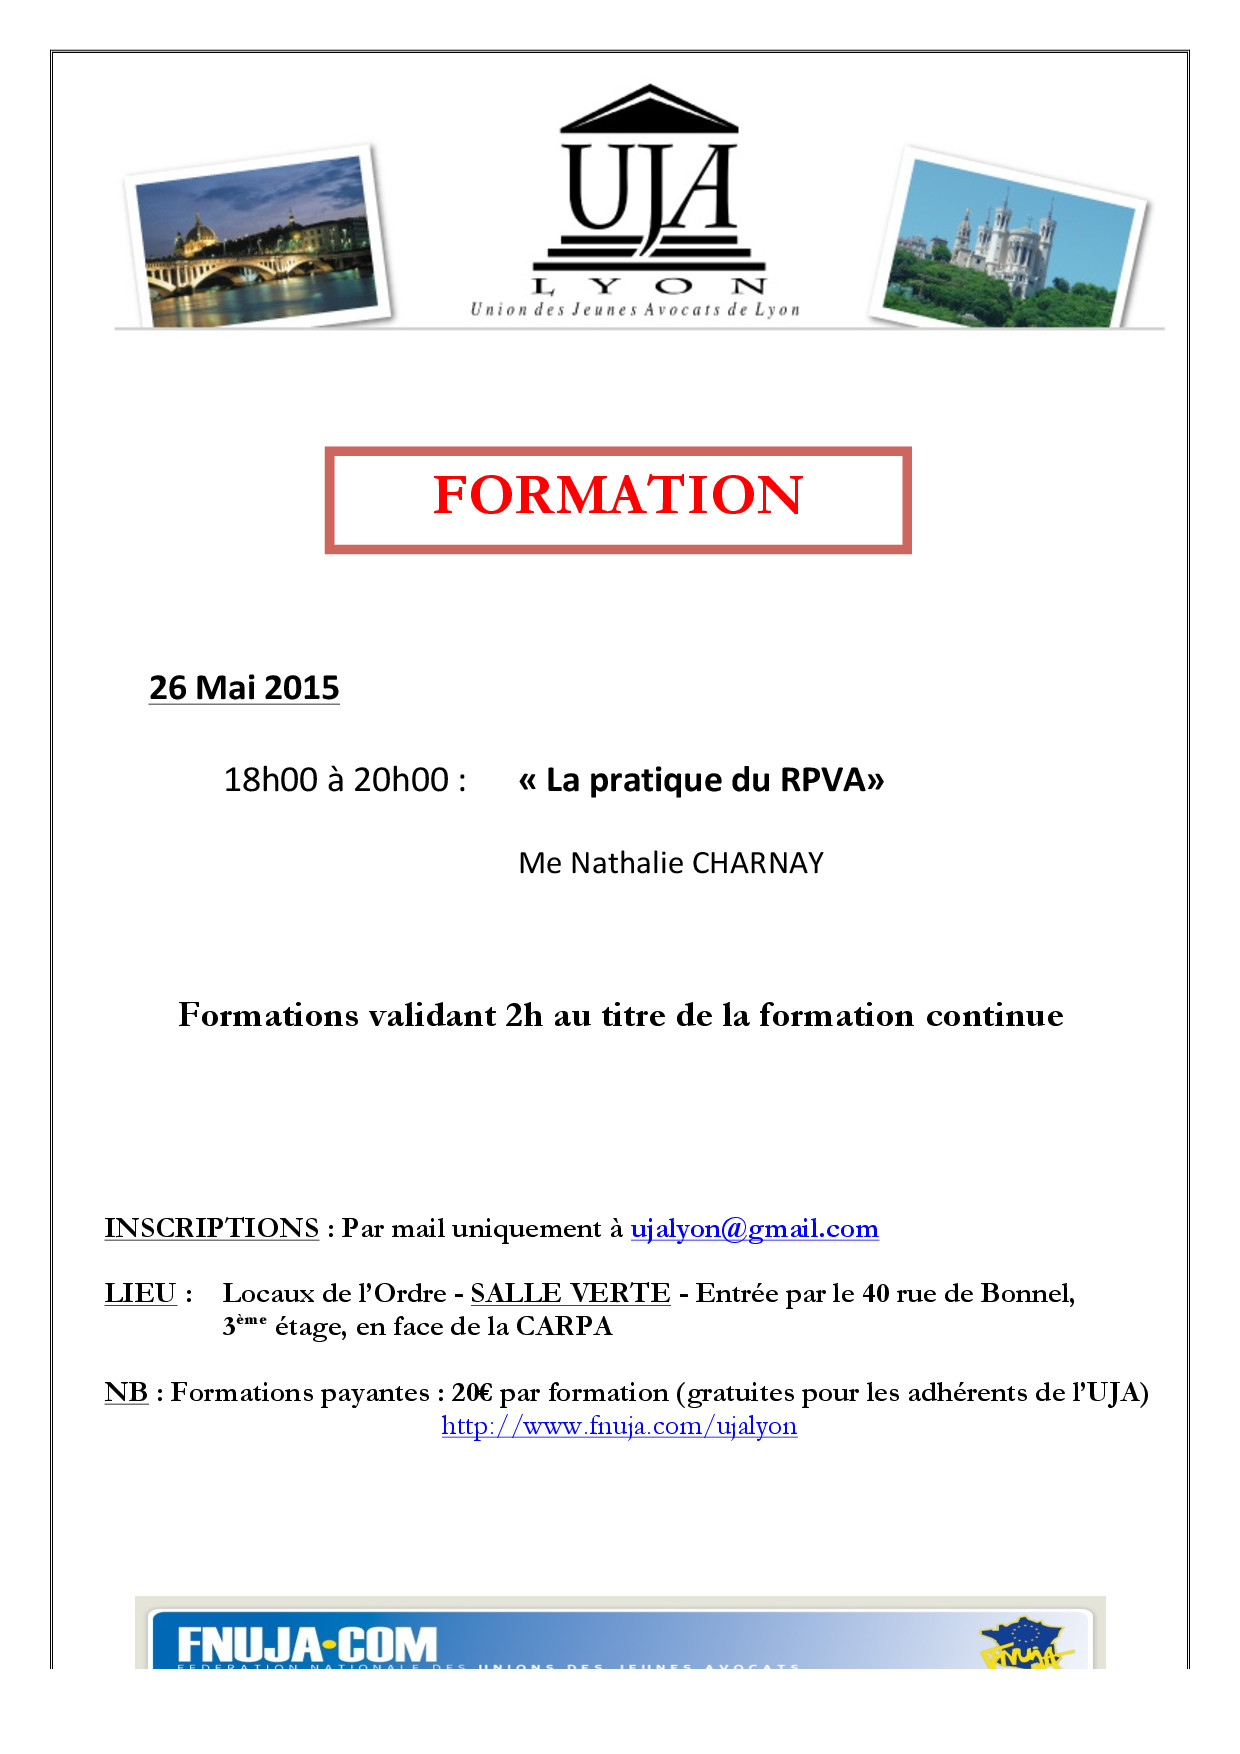 formation 26 mai 2015